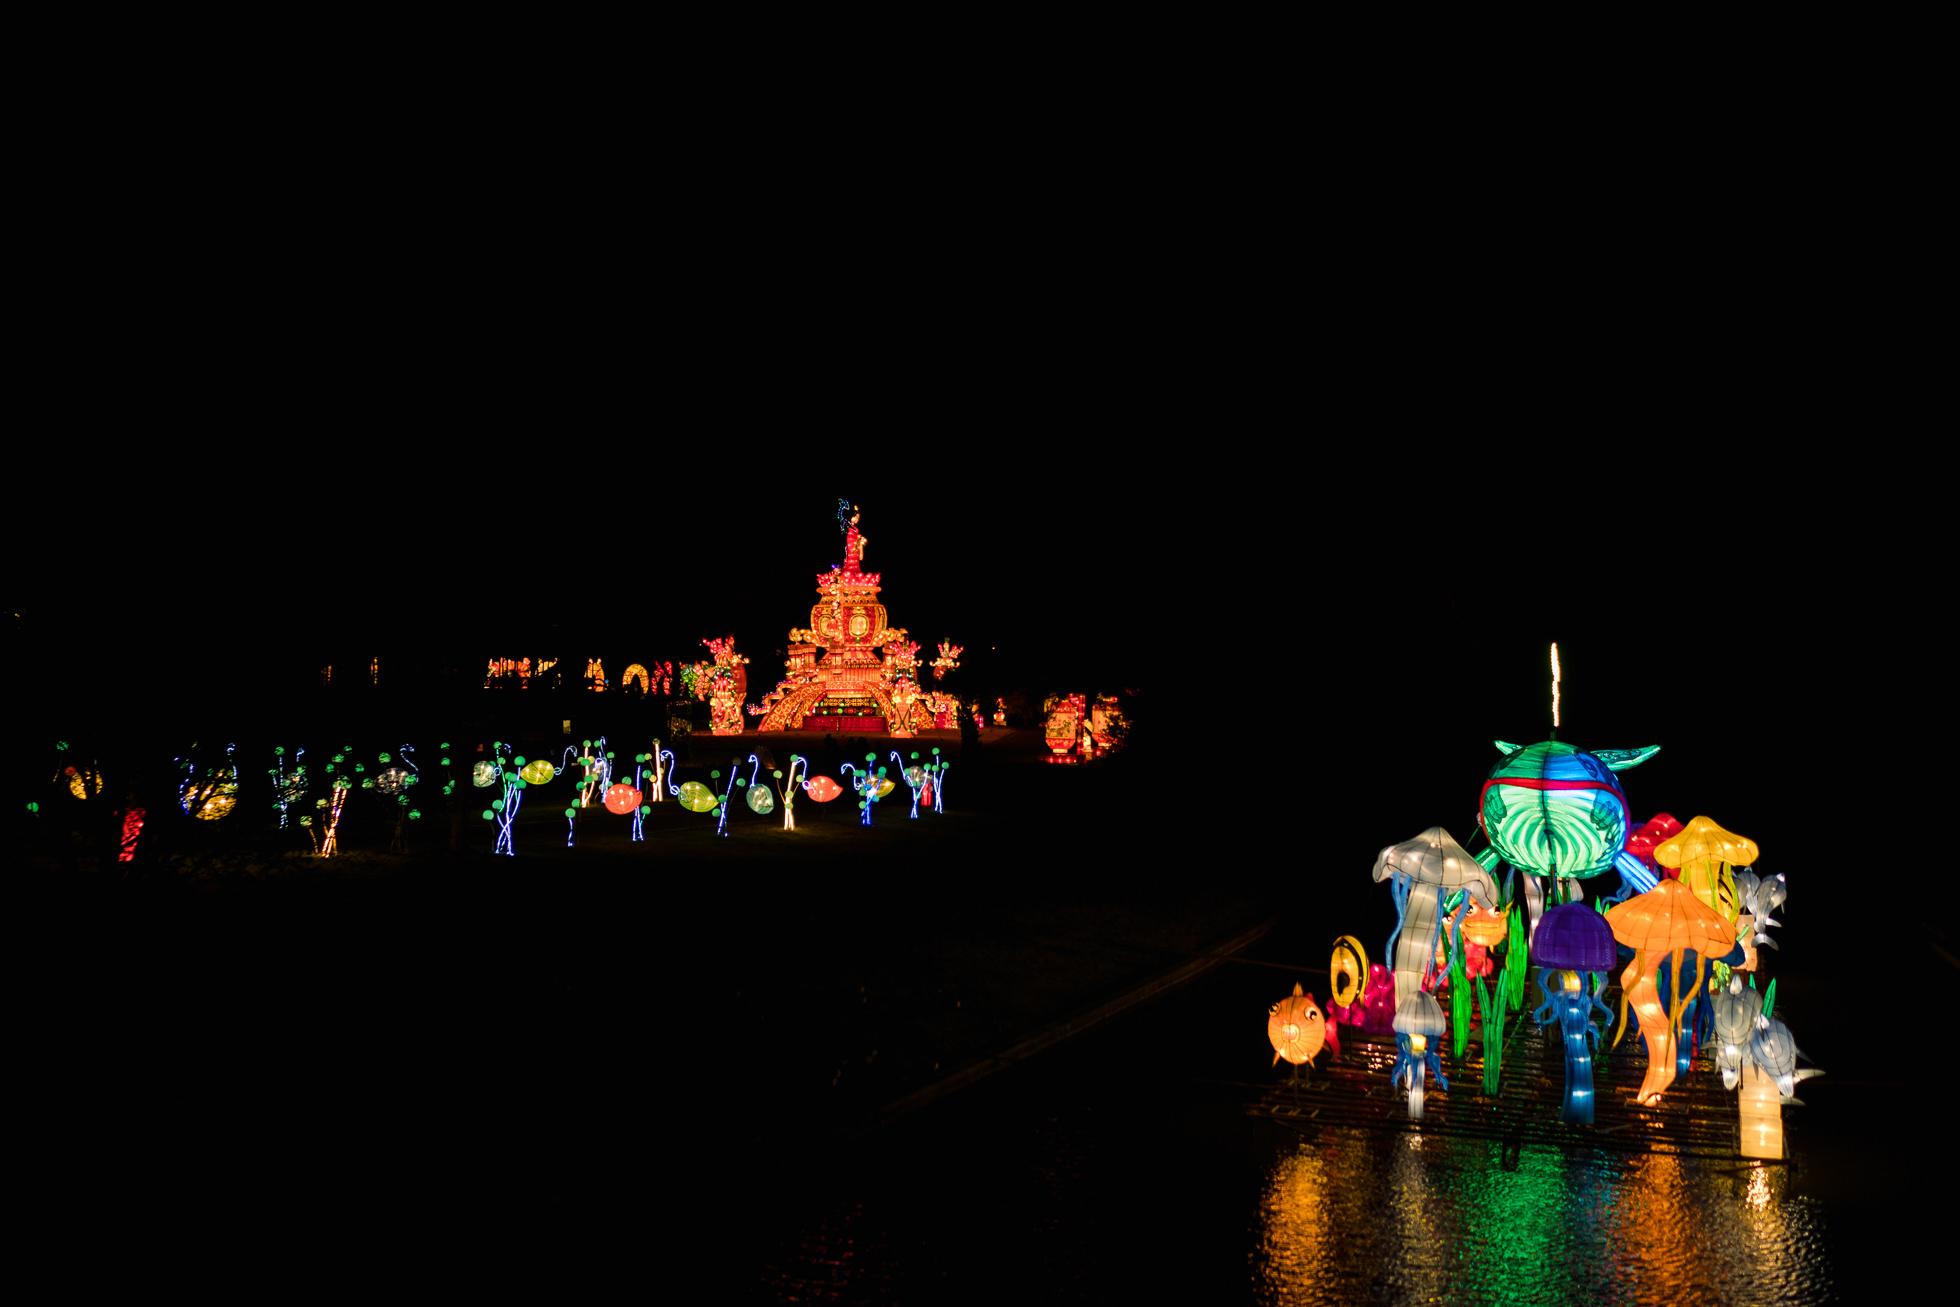 norfolk botanical gardens, lantern asia exhibit